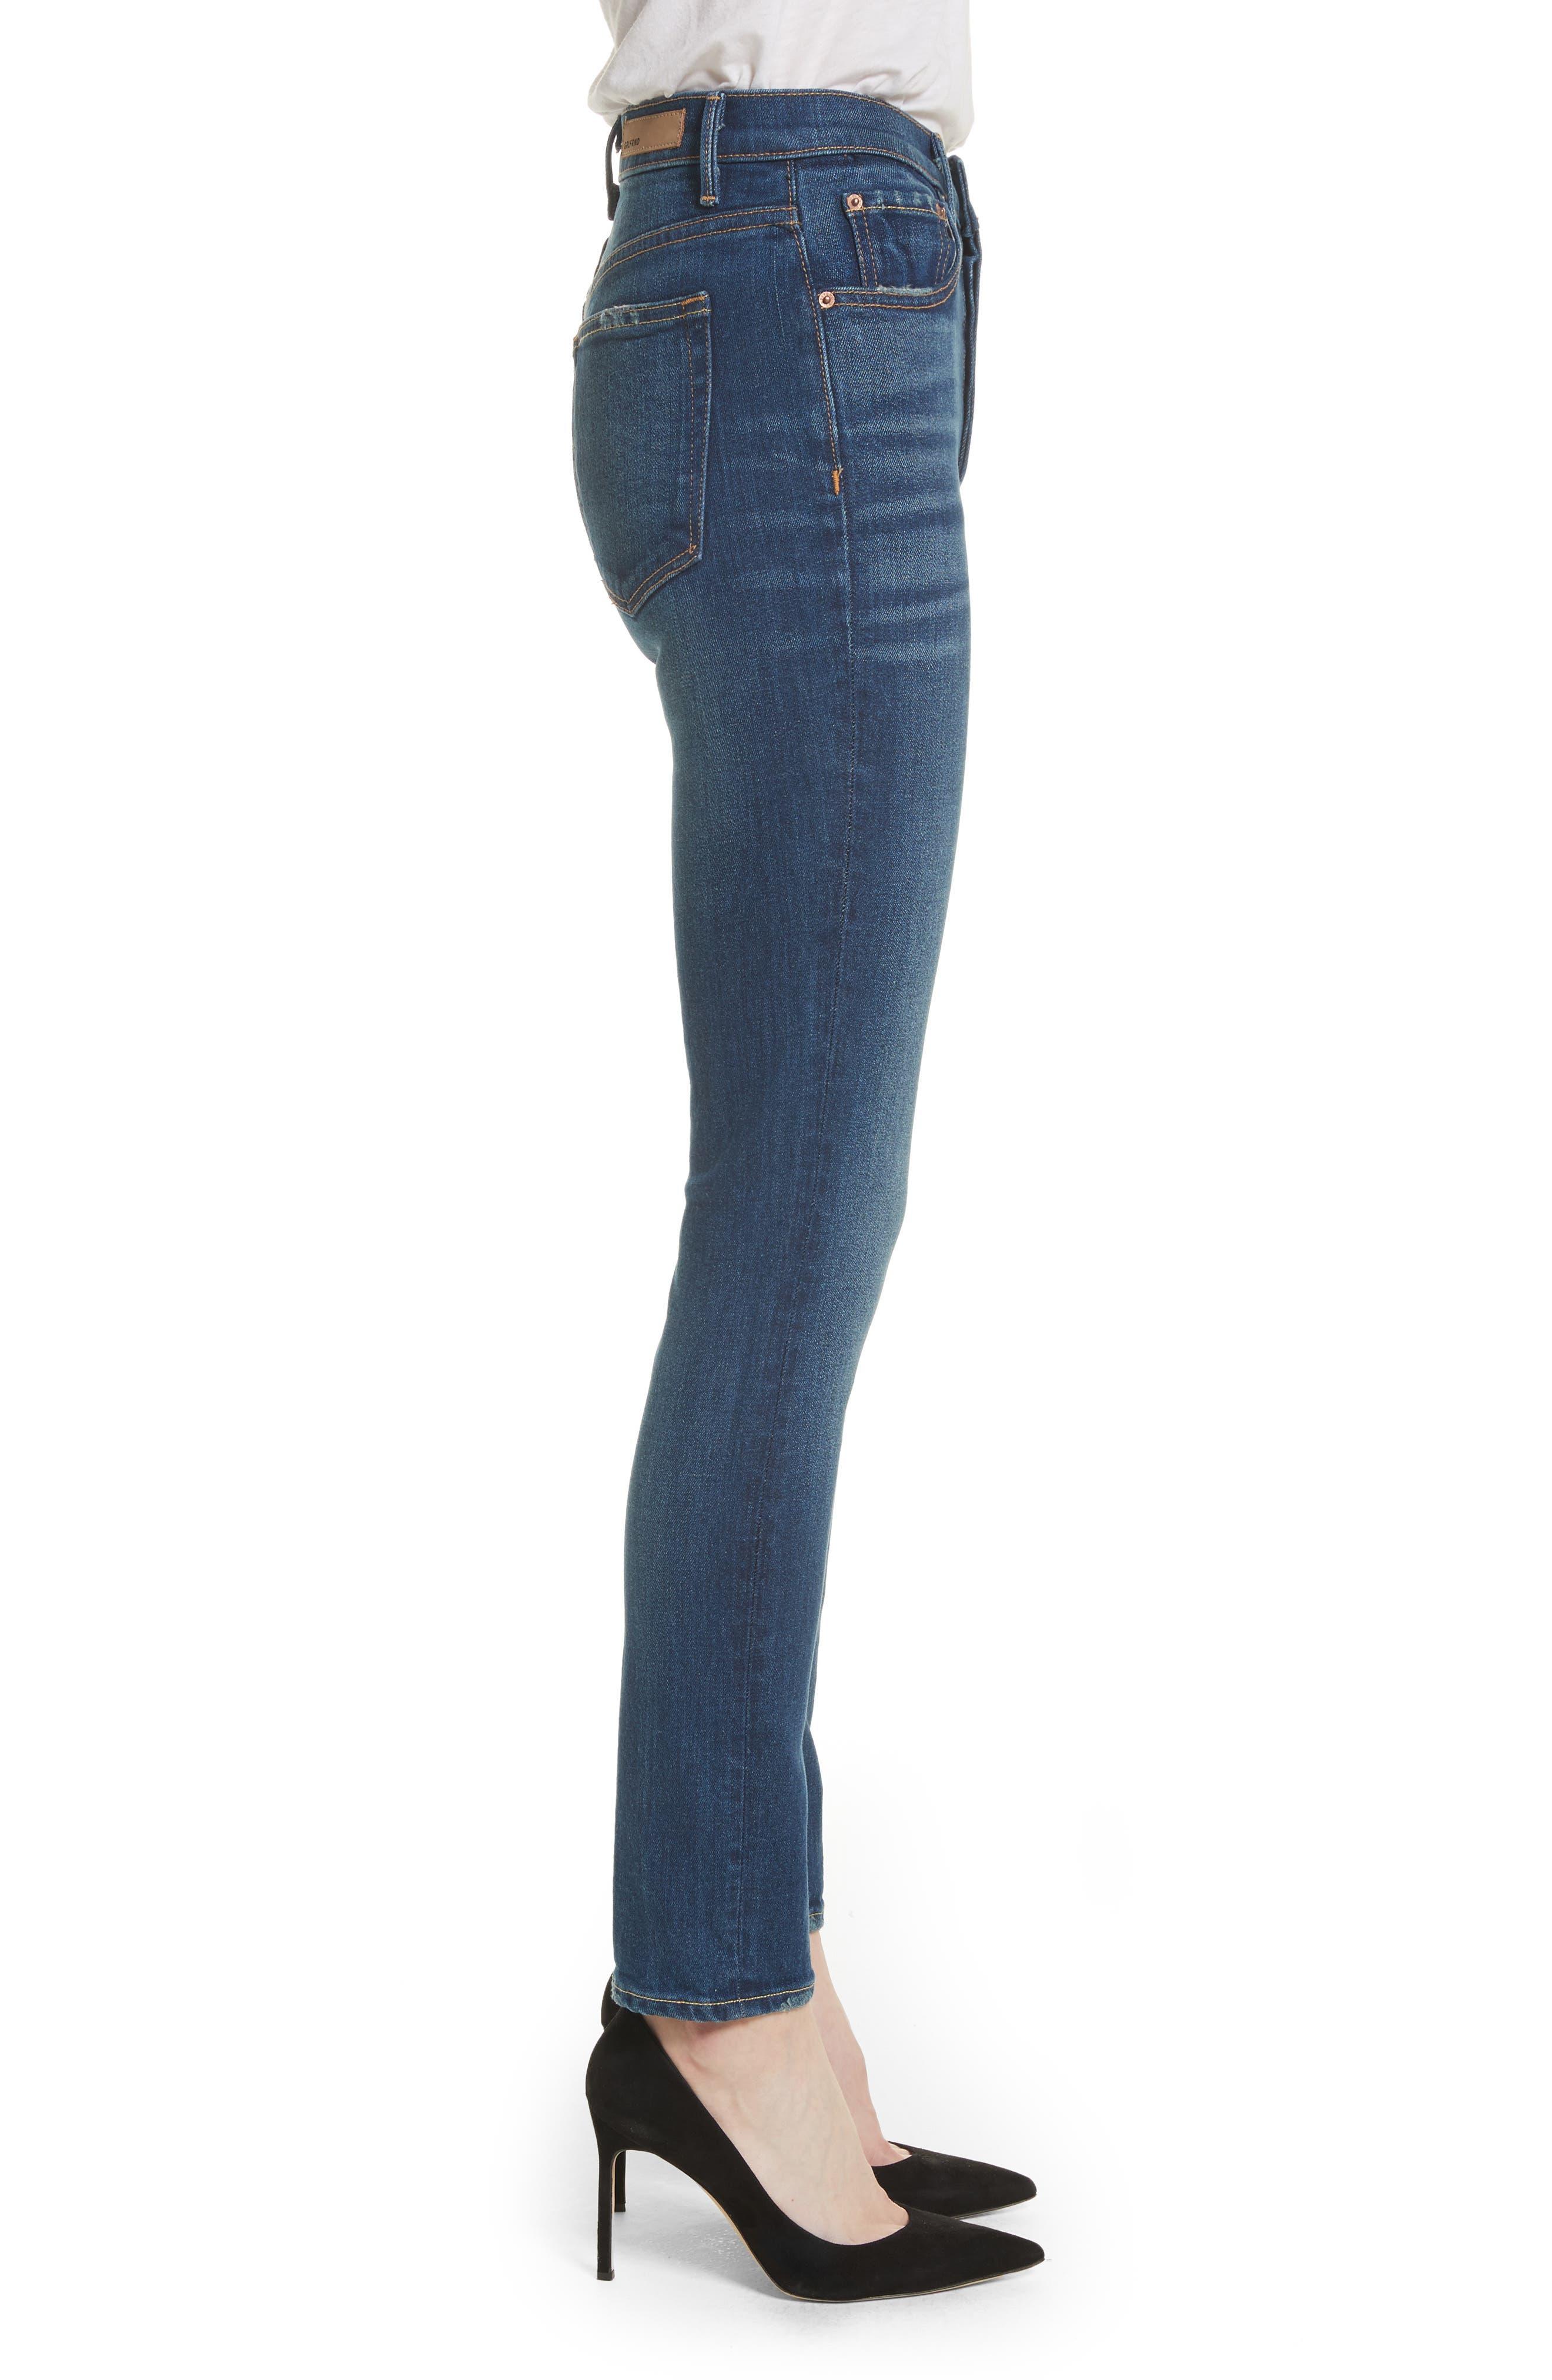 Karolina High Waist Skinny Jeans,                             Alternate thumbnail 3, color,                             Joan Jett